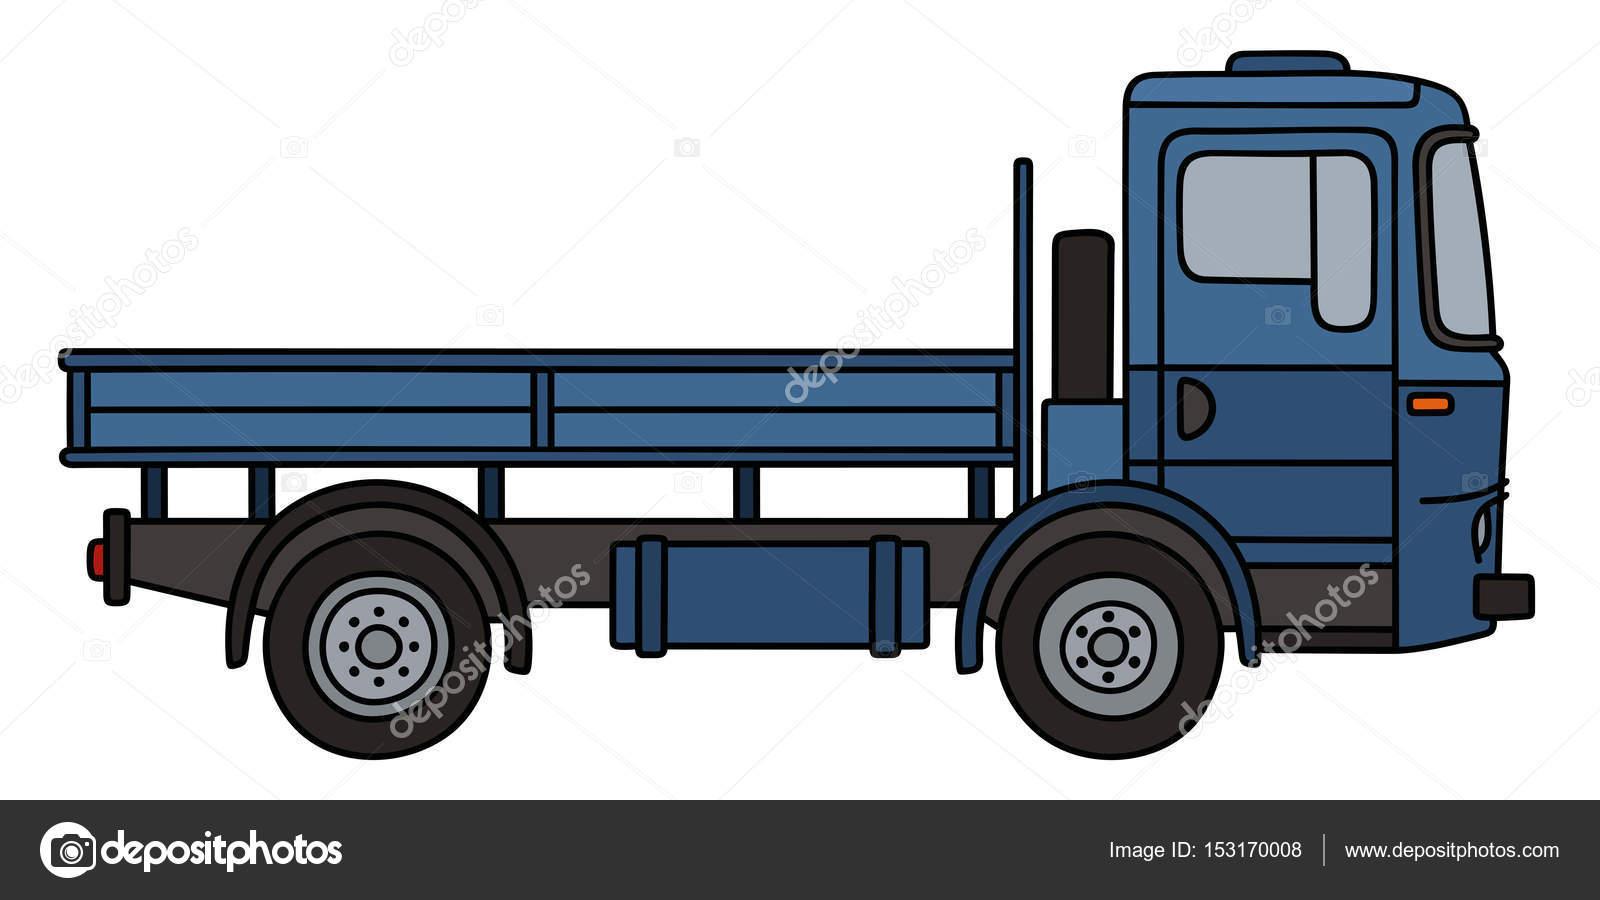 1600x900 Blue Flatbed Truck Stock Vector 2v